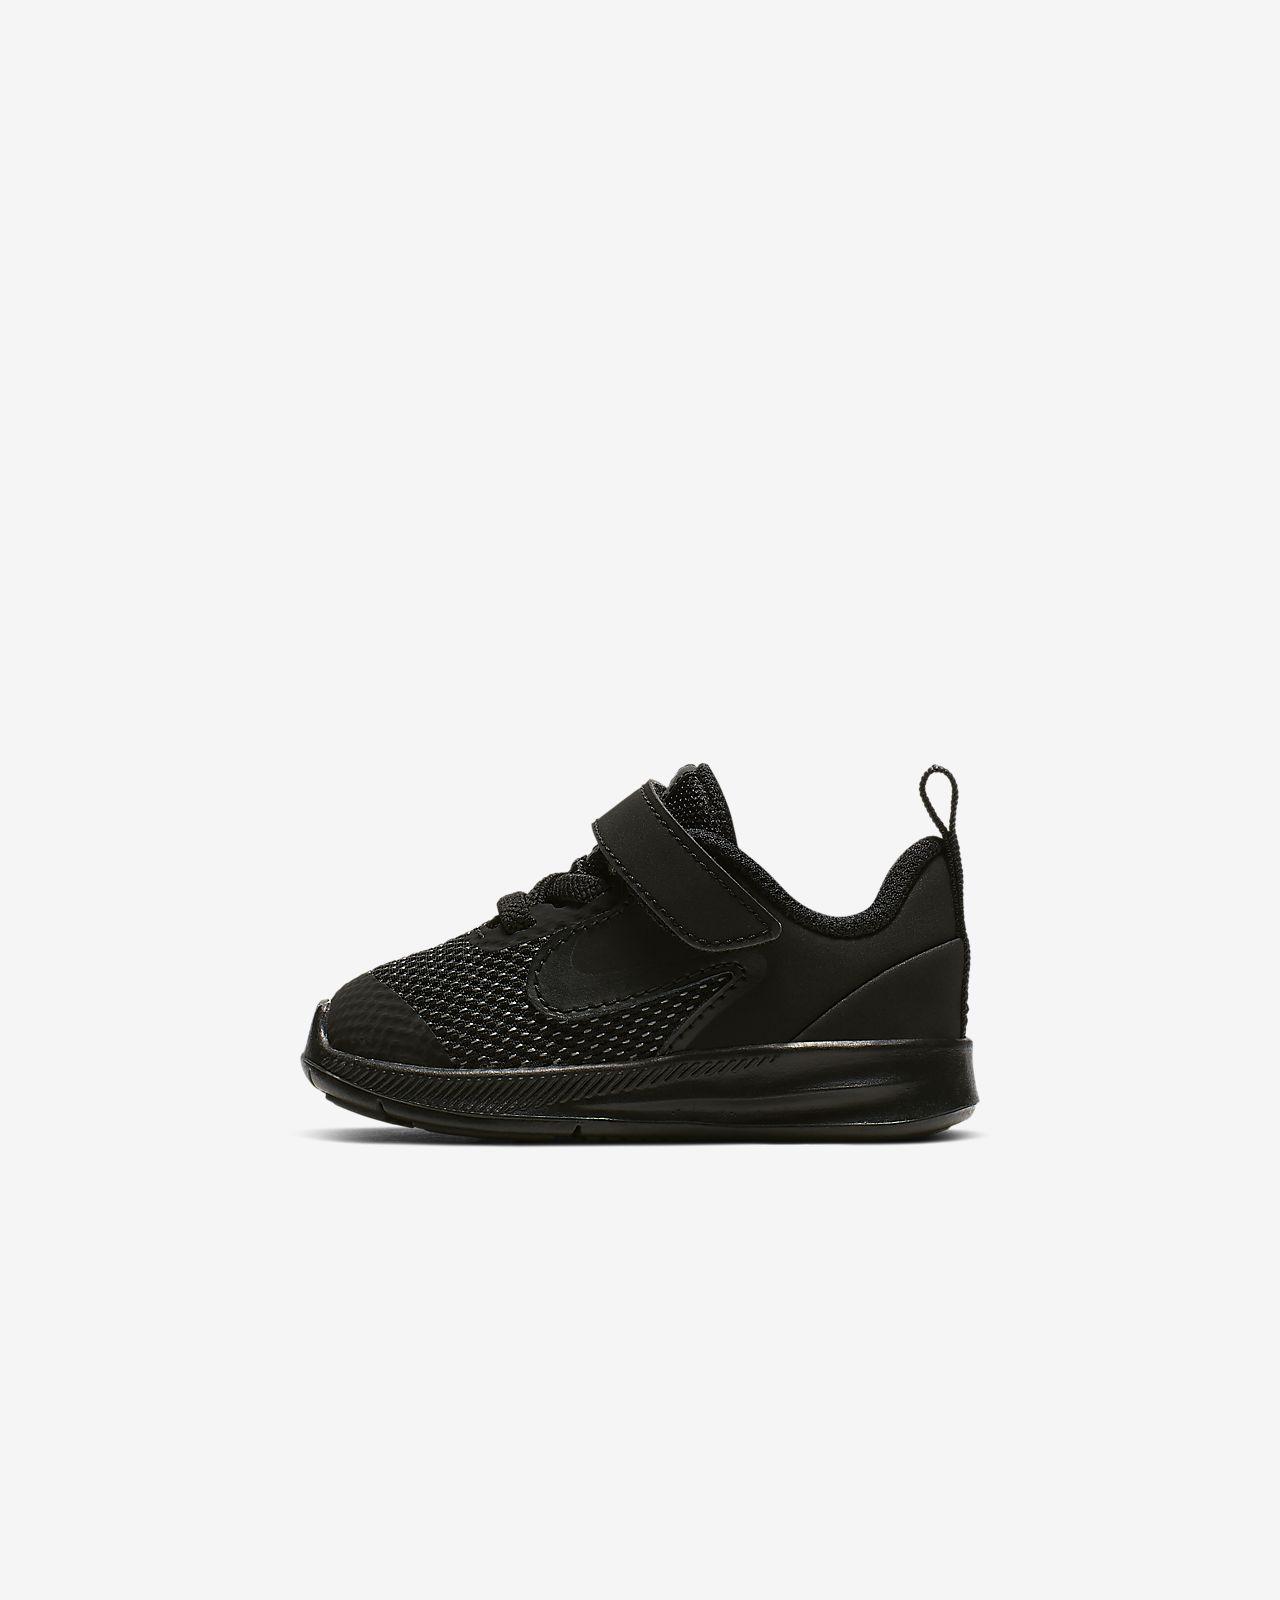 Nike Downshifter 9 Zapatillas Bebé e infantil